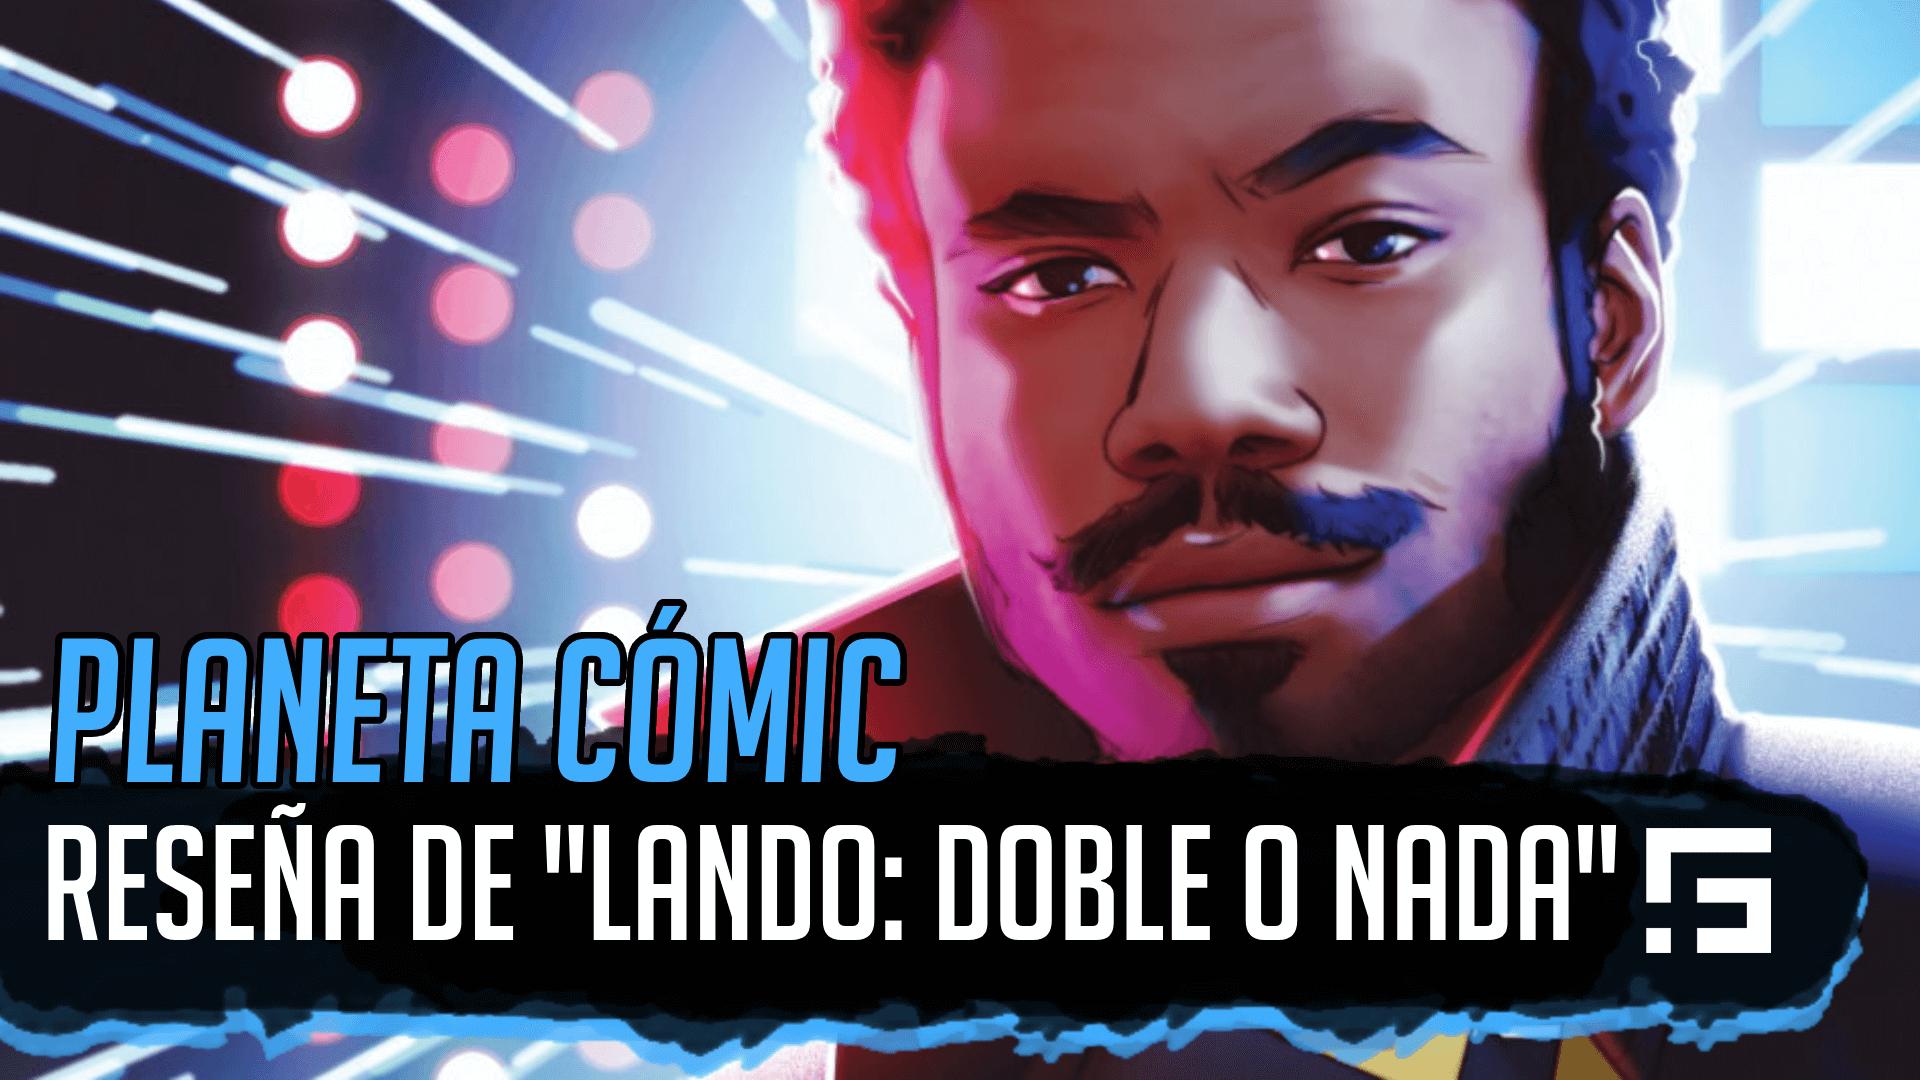 Reseña de Lando Doble o Nada Cómic de Star Wars